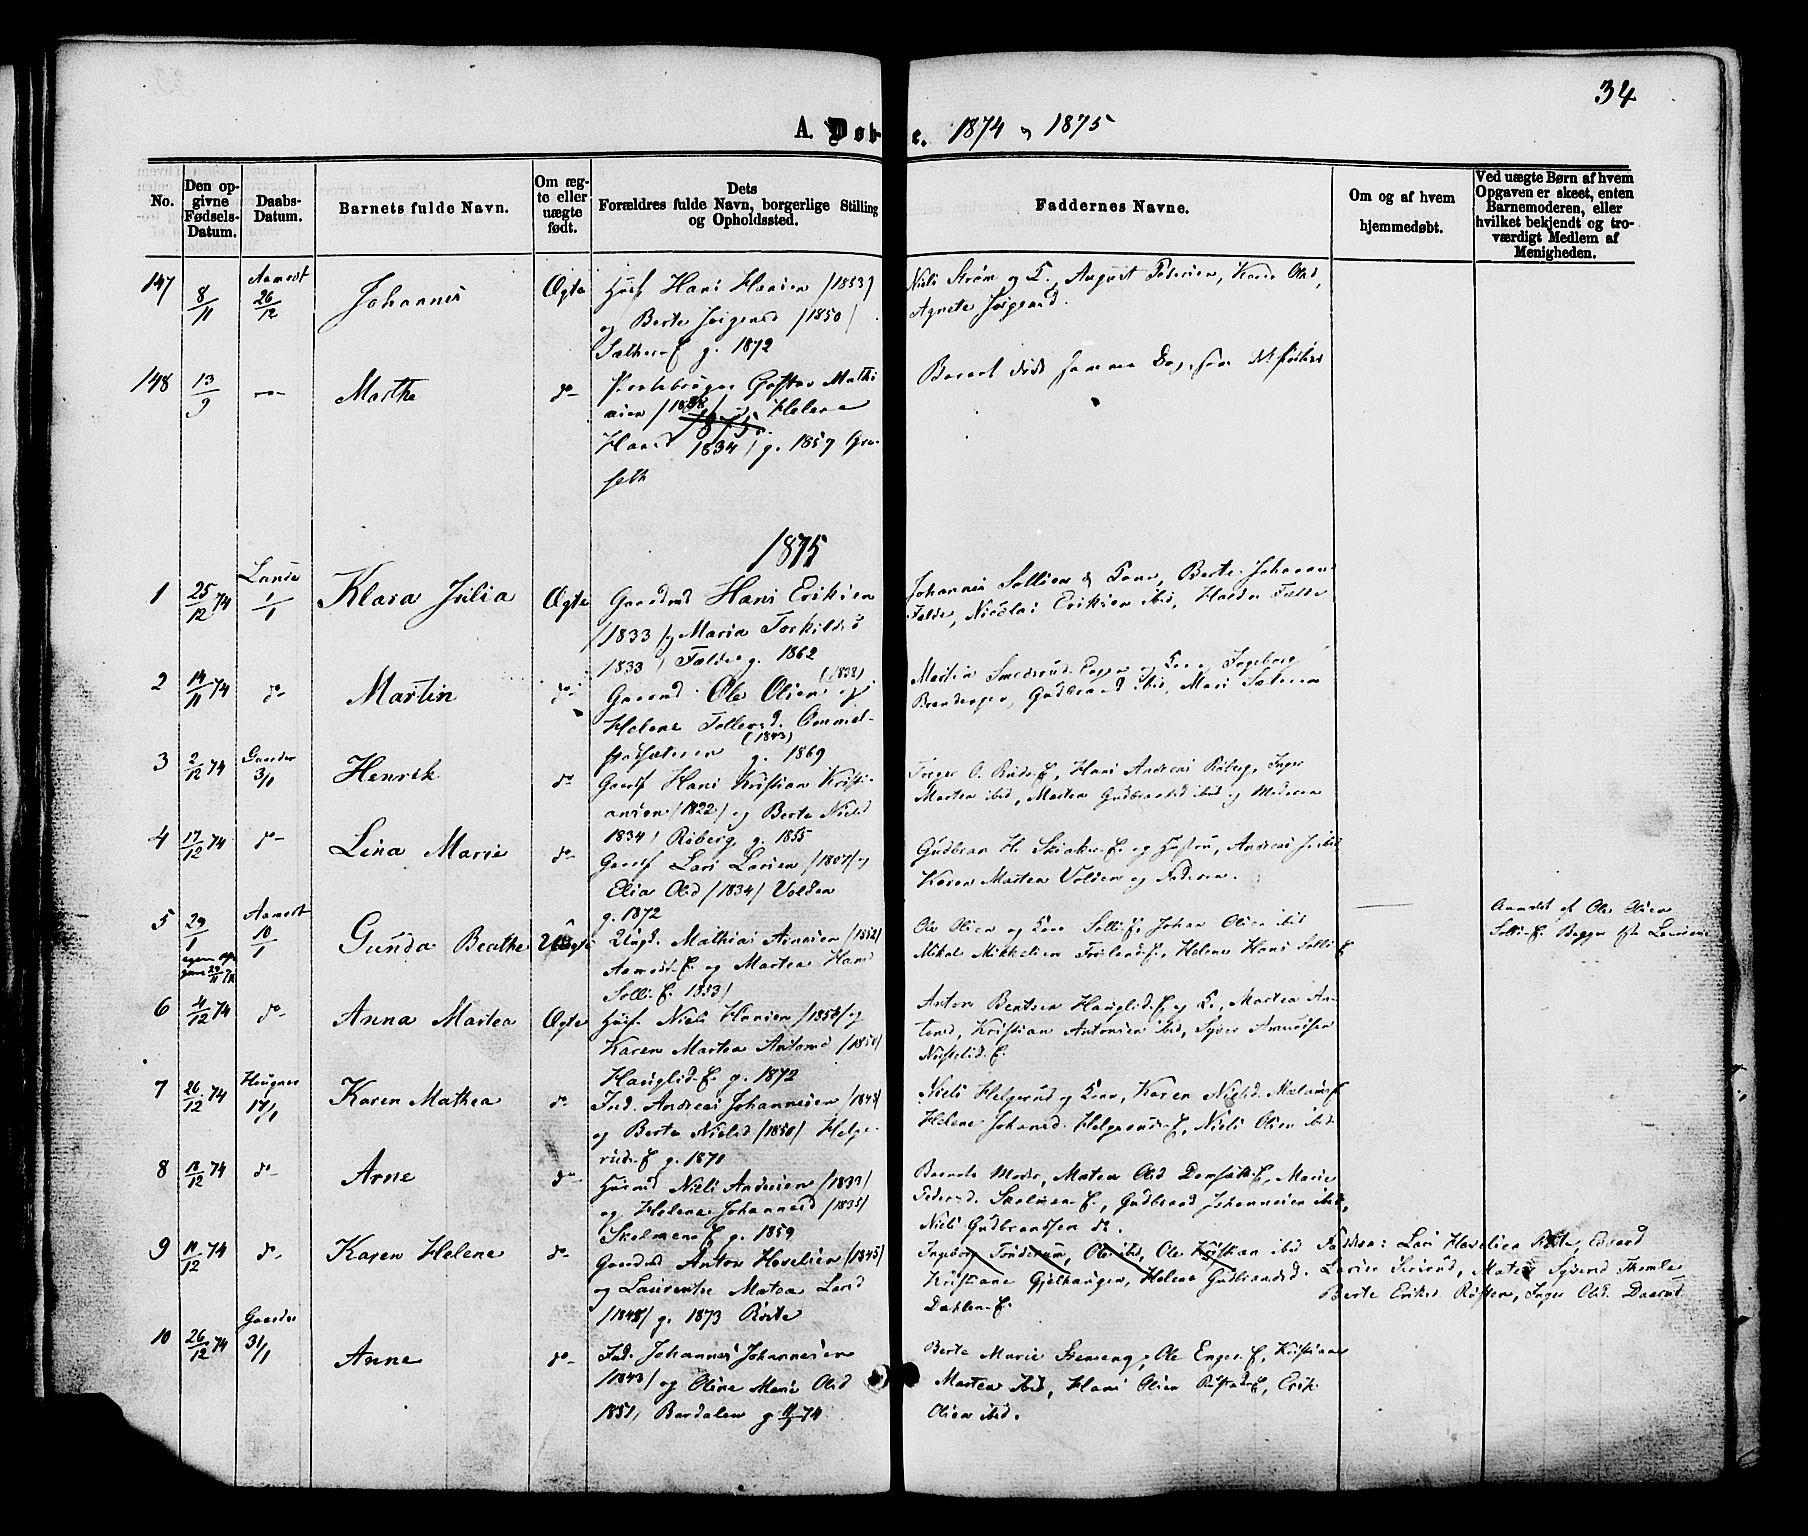 SAH, Nordre Land prestekontor, Ministerialbok nr. 2, 1872-1881, s. 34